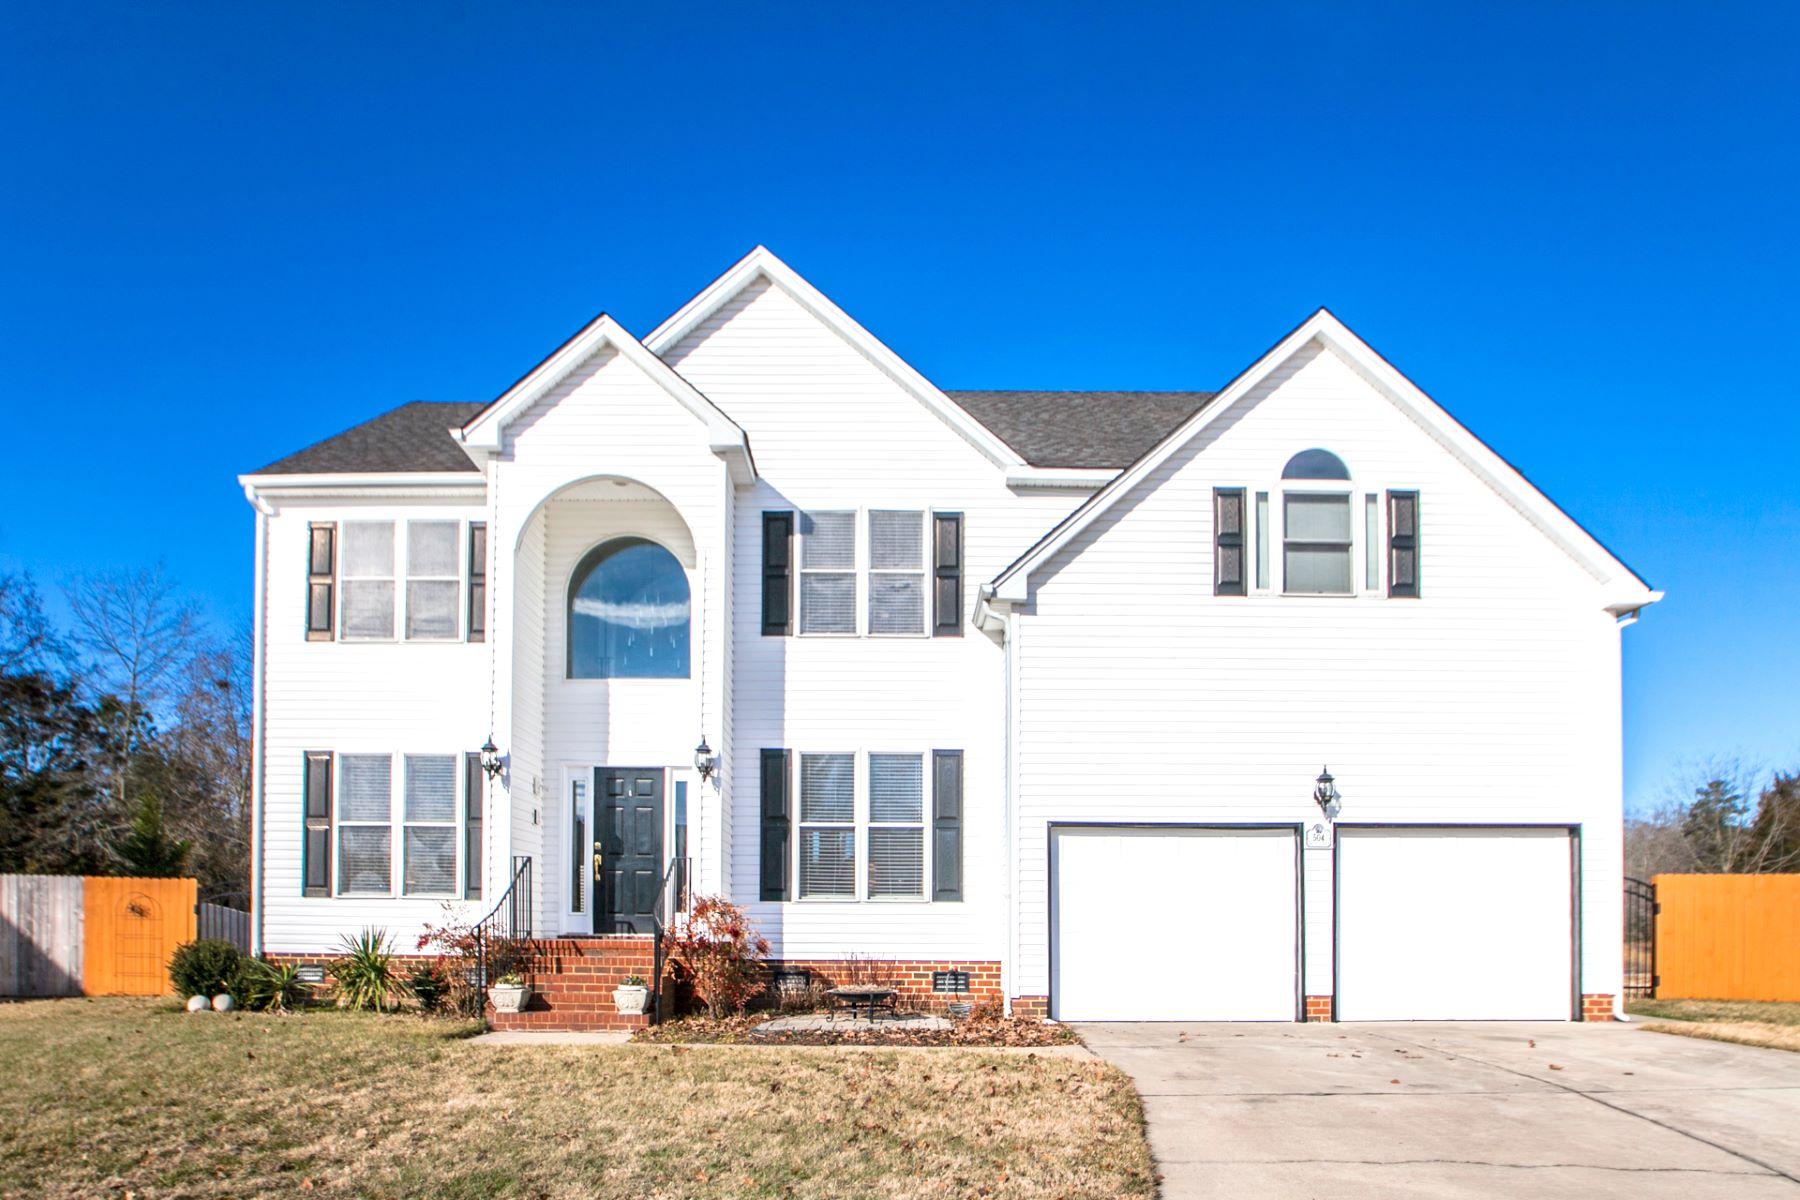 واحد منزل الأسرة للـ Sale في RIO VISTA 504 Miami Dr, Chesapeake, Virginia, 23323 United States